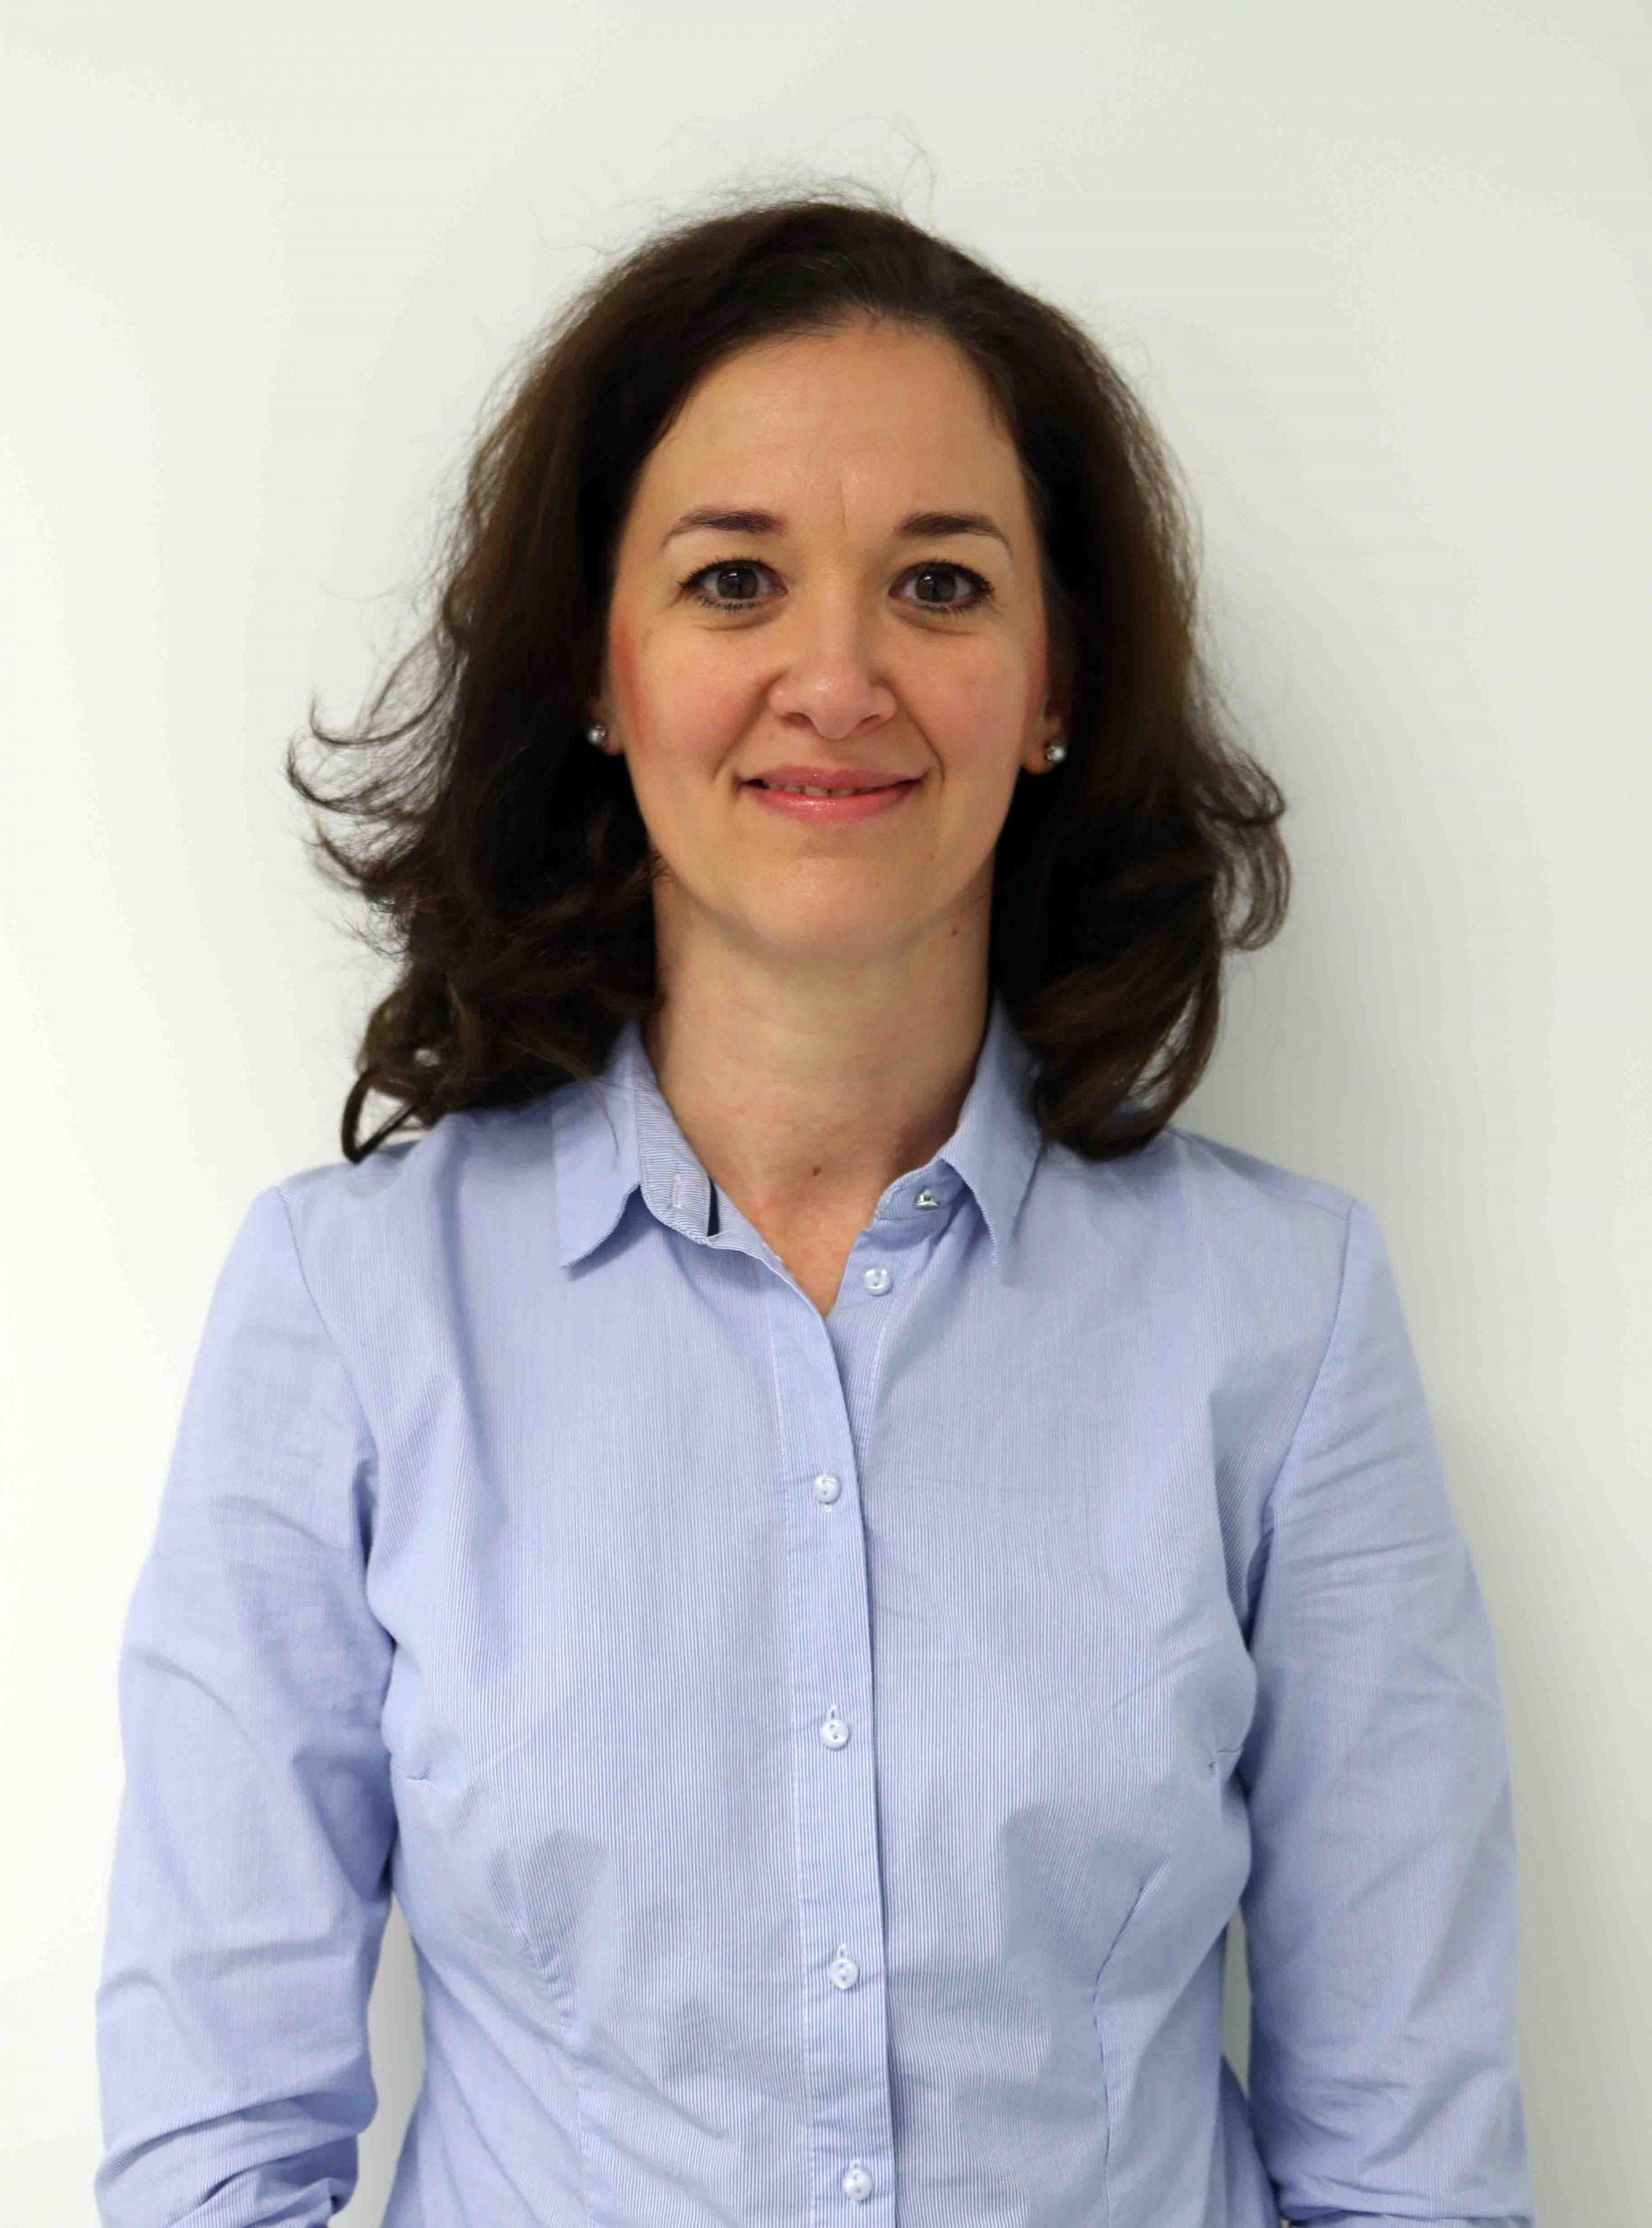 Németh Zsanett